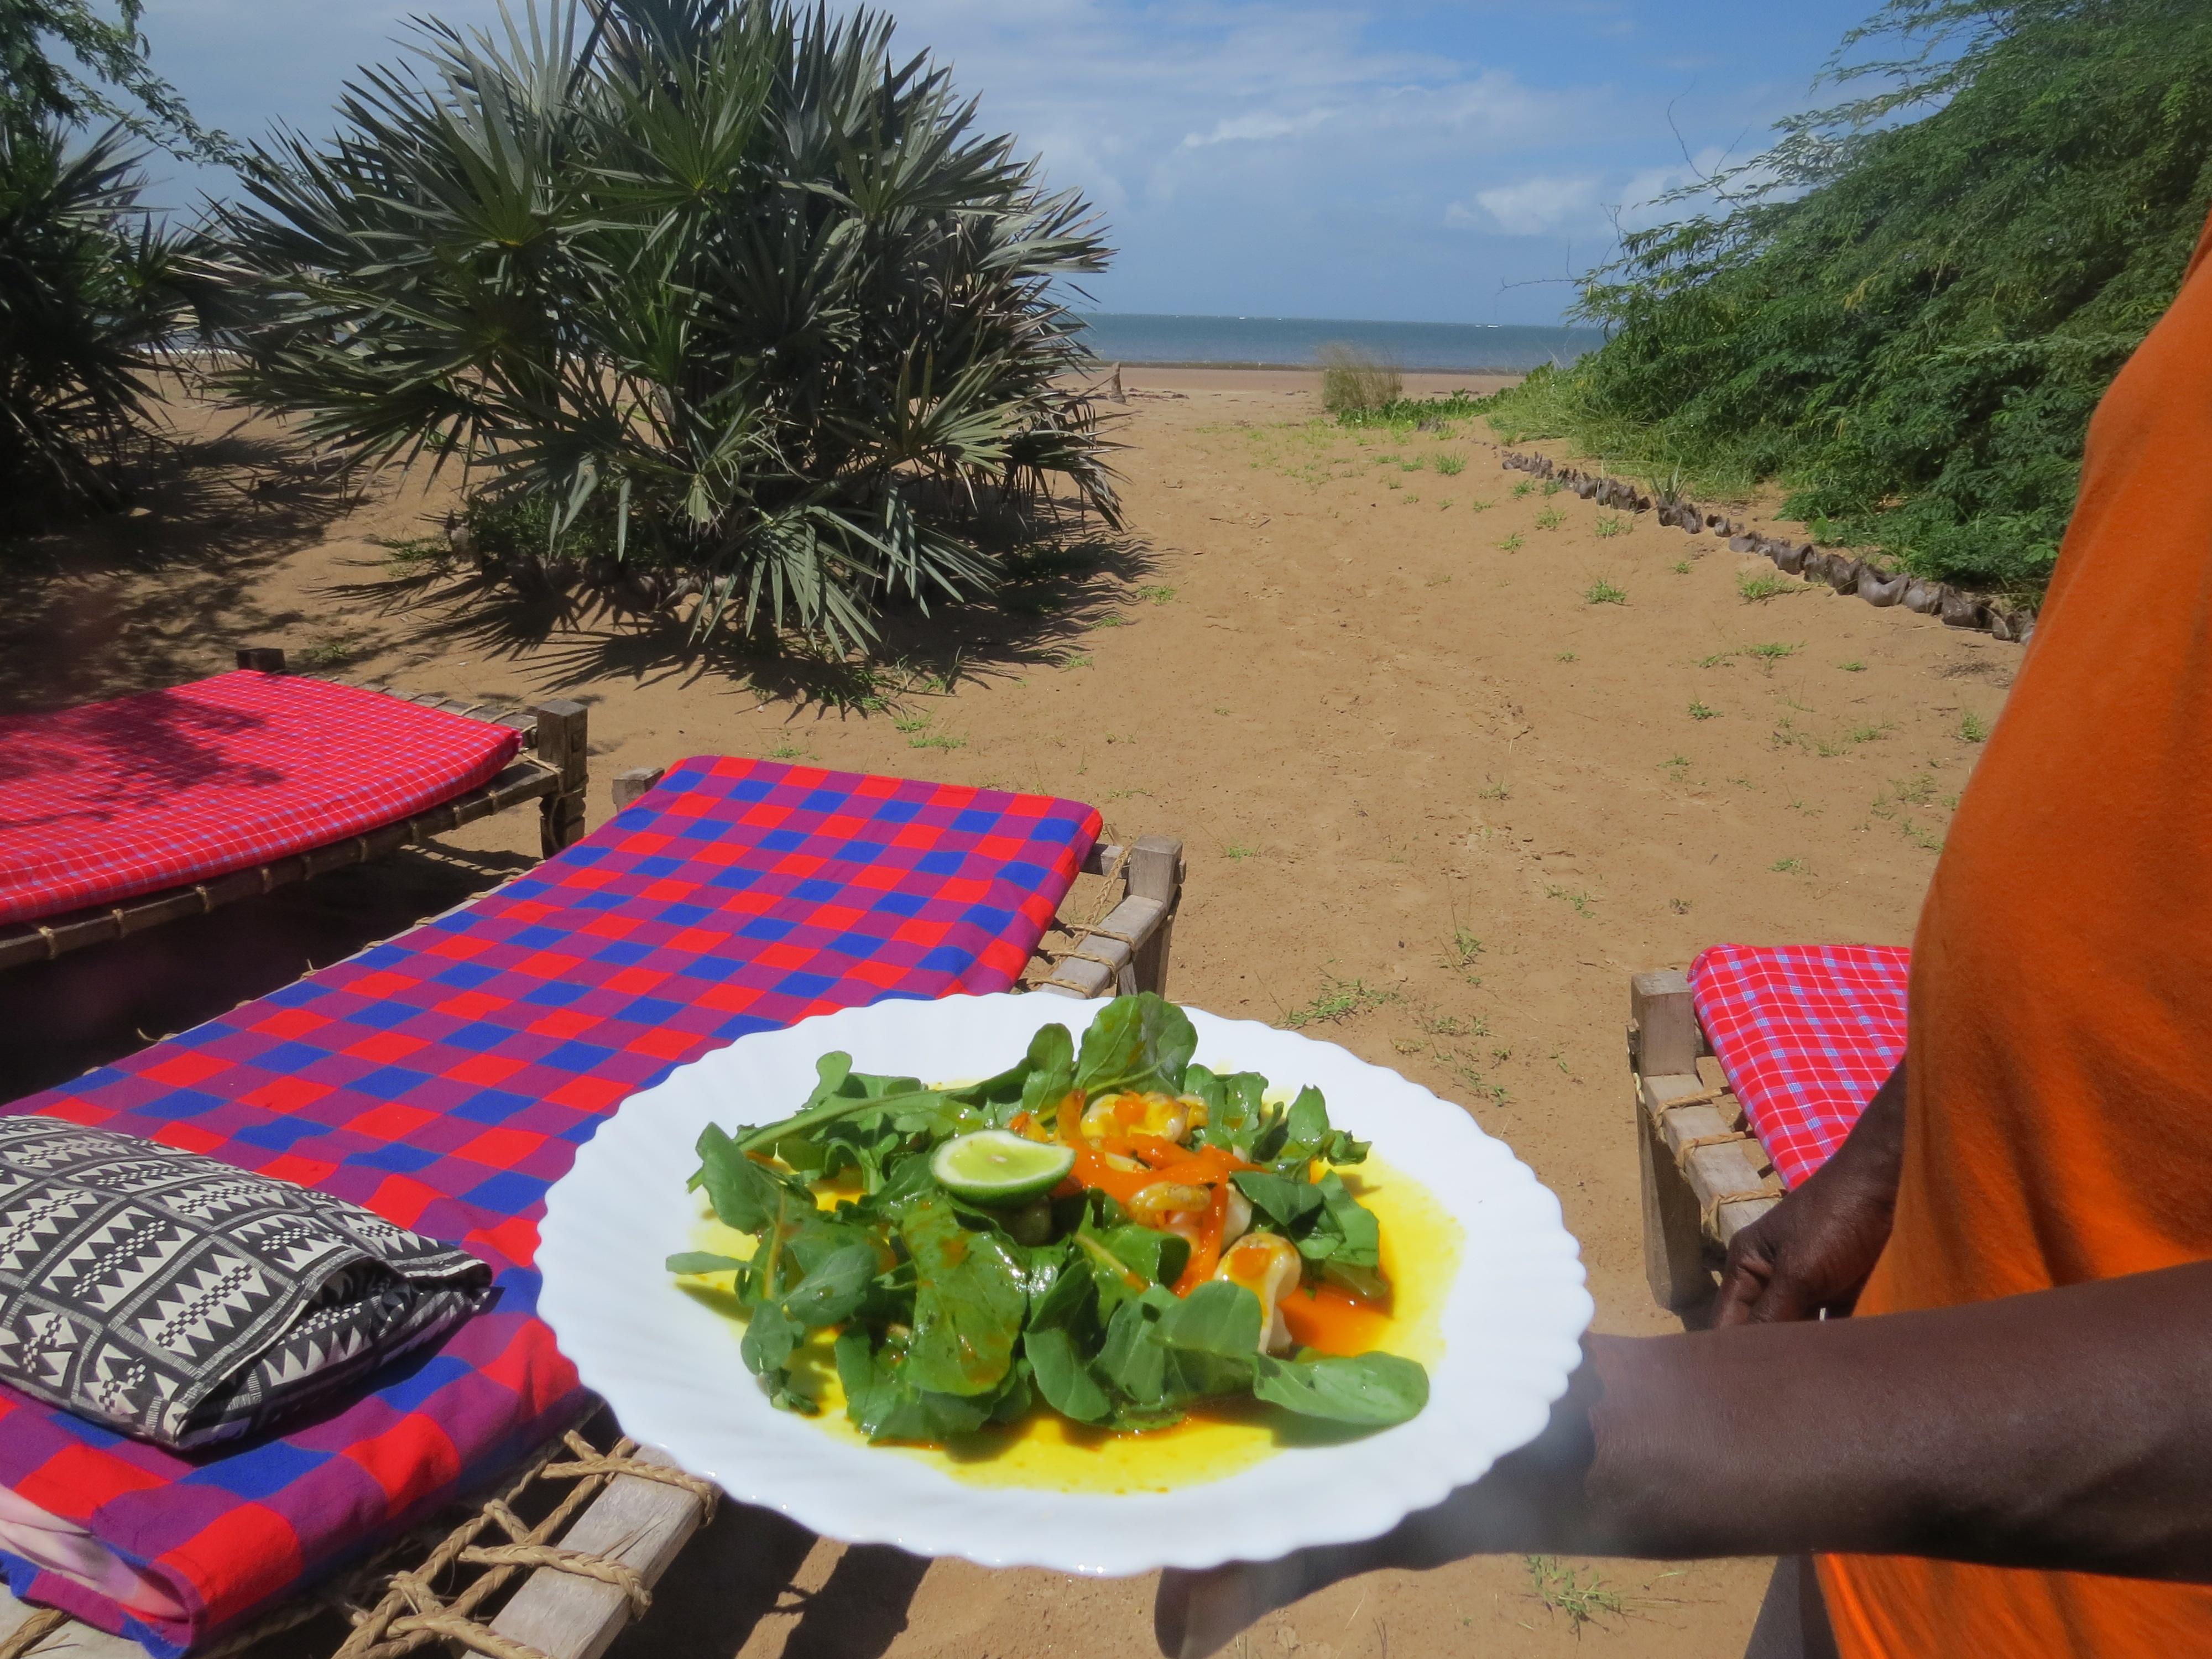 Calamari in orange saucewith a tinge of saffron at Barefoot Beach Camp in Malindi. Copyright Rupi Mangat